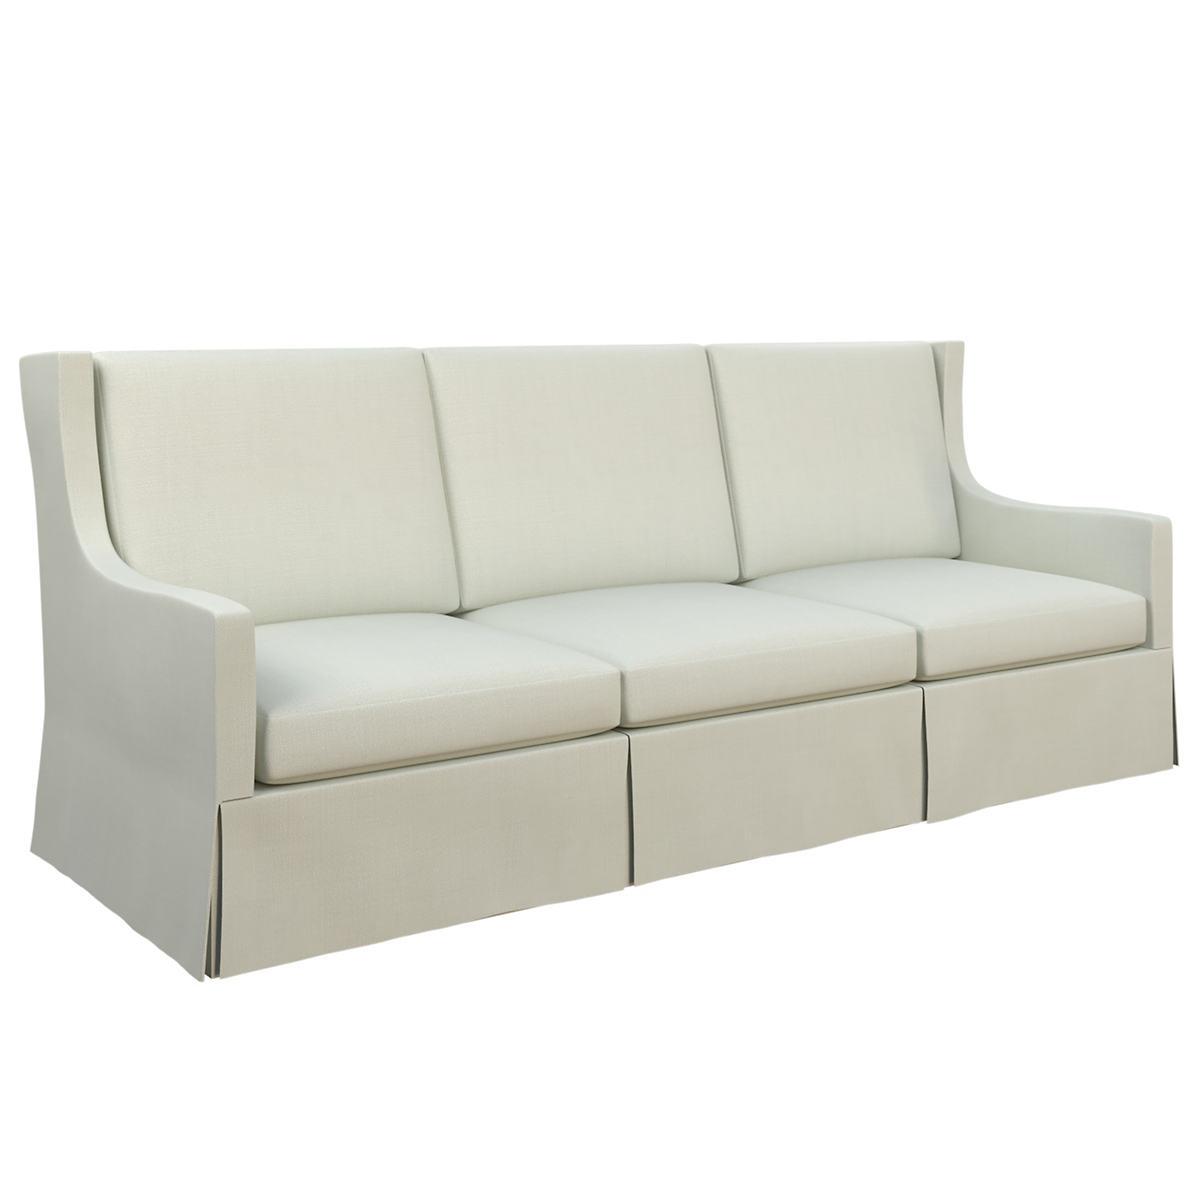 Nubby Mist Toulouse Sofa